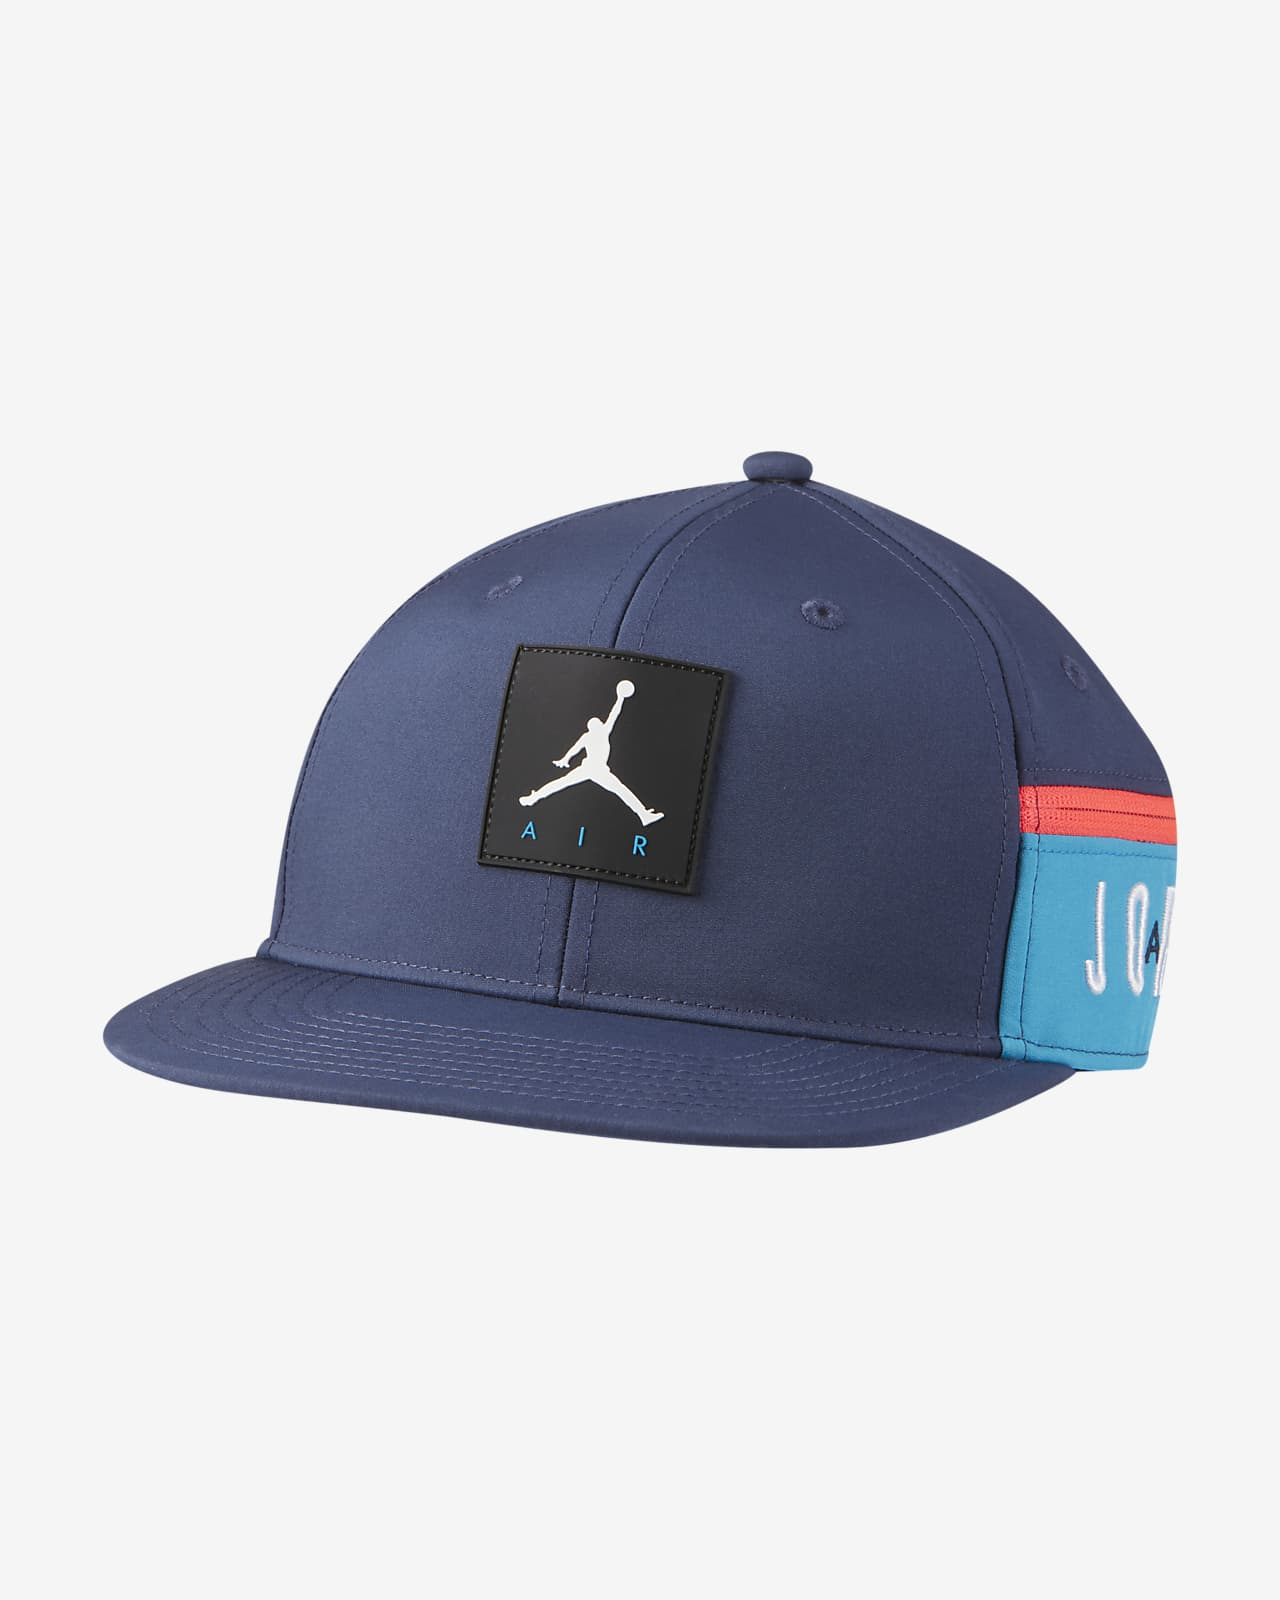 Jordan Kids' Adjustable Hat